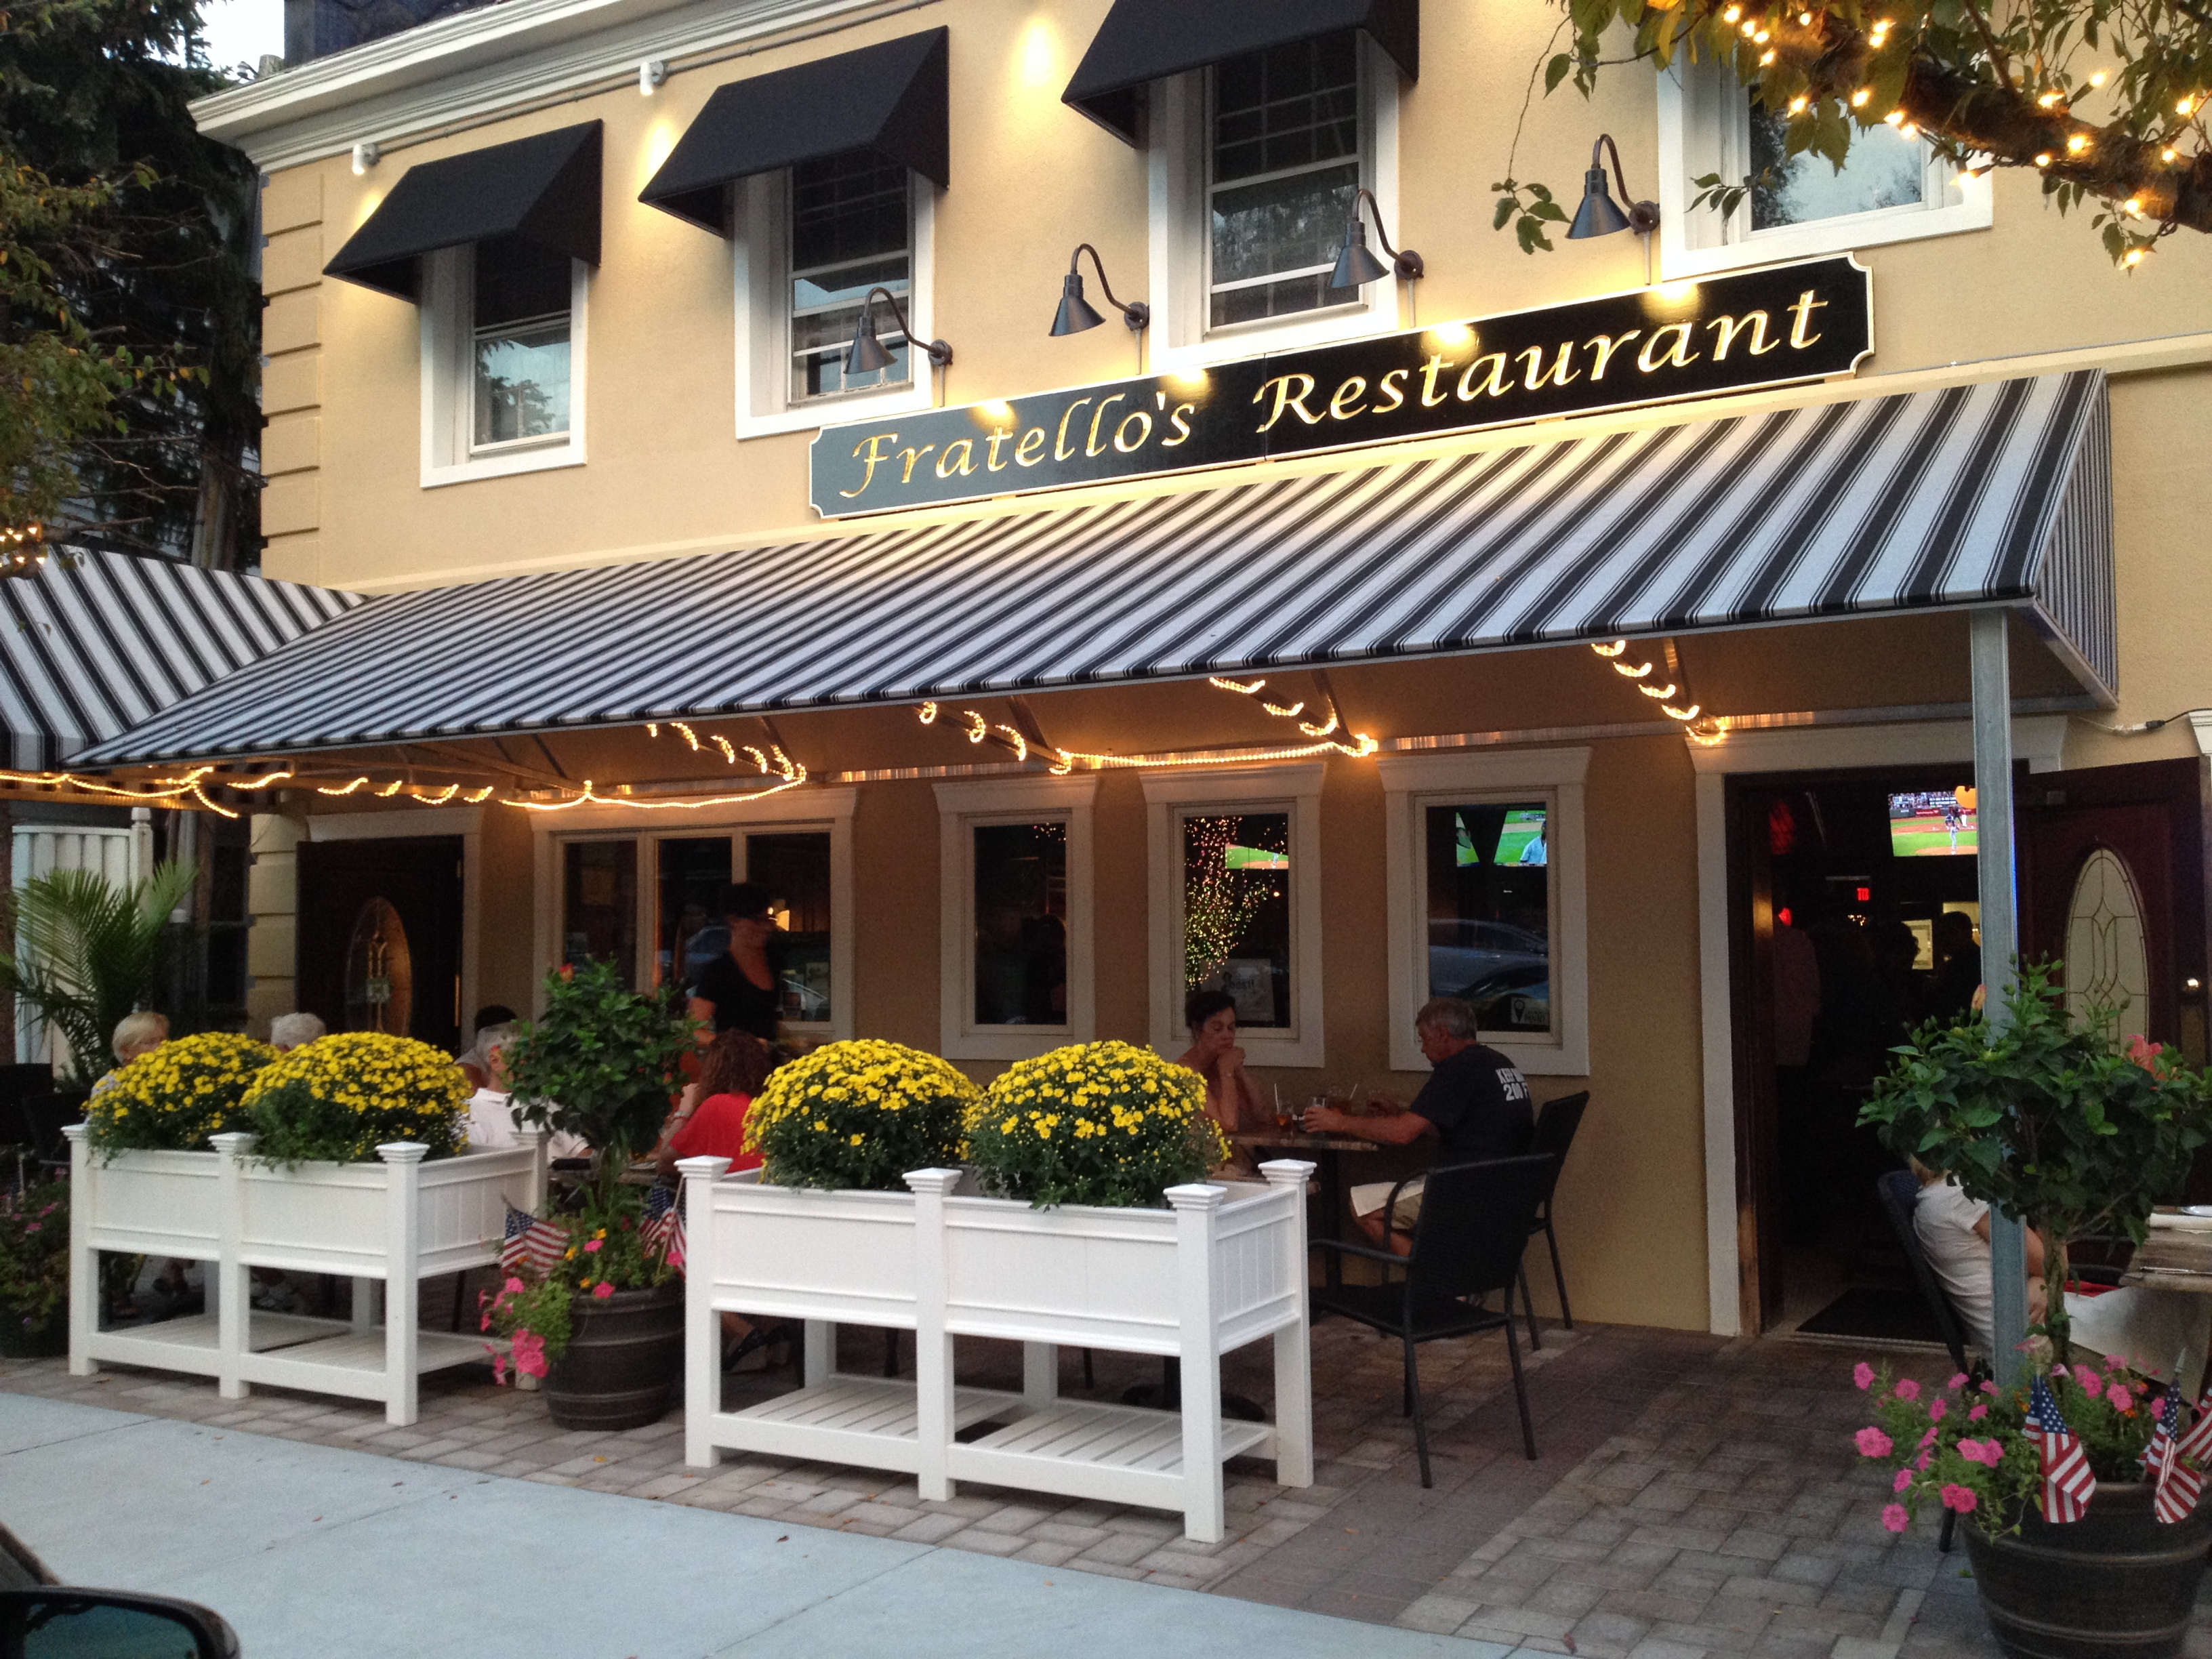 Fratello's Restaurant & Lounge